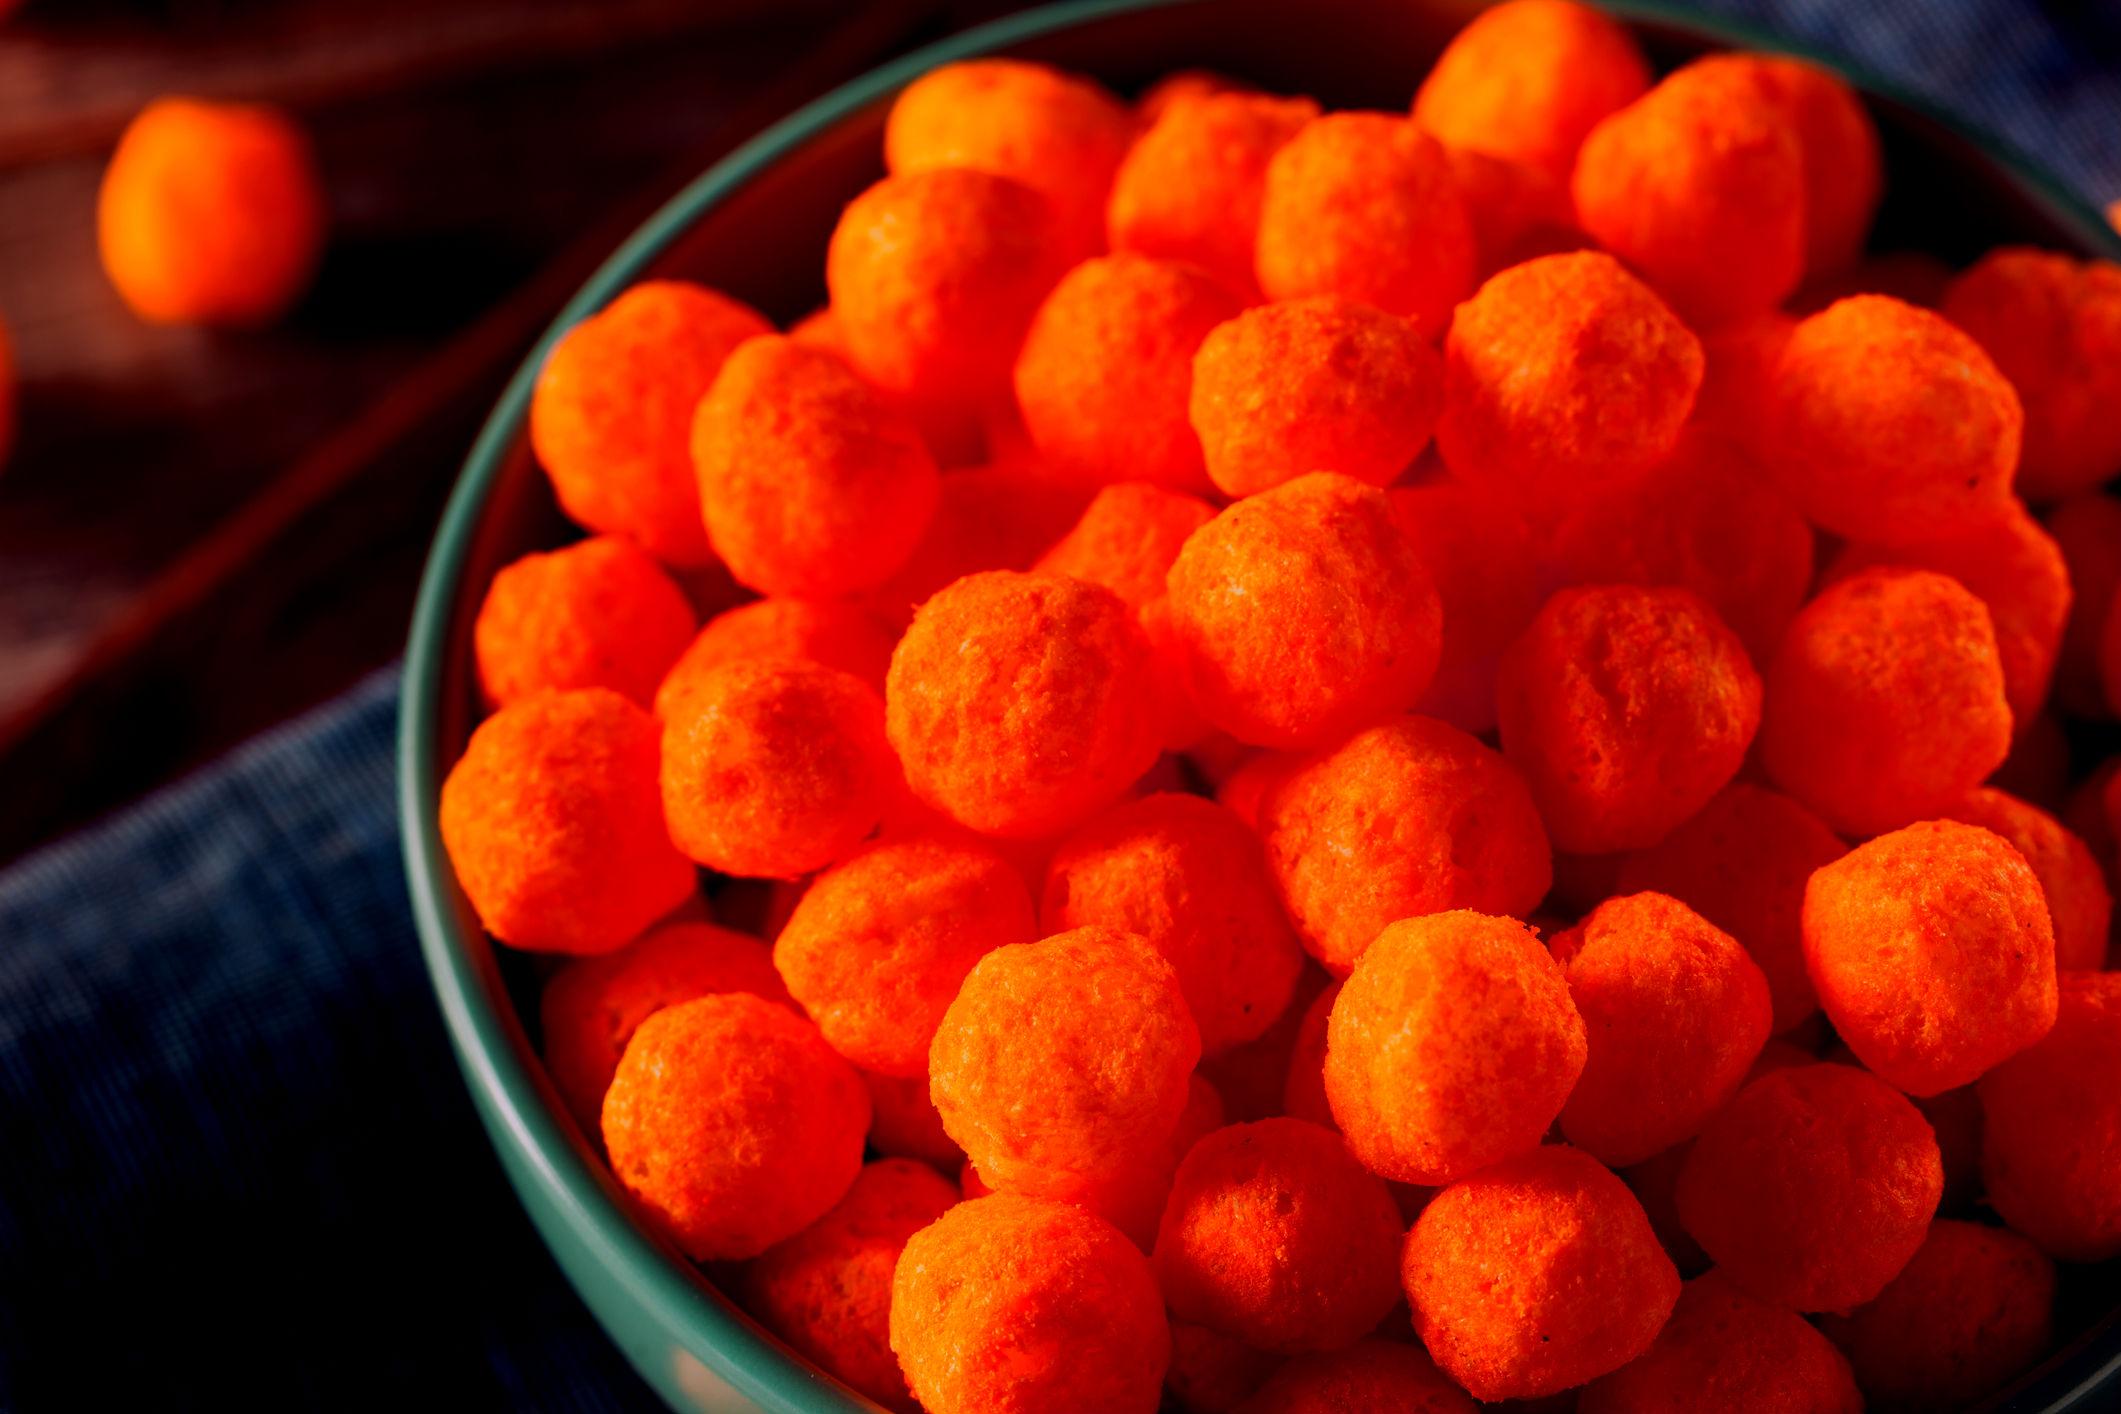 flamin' hot cheetos asteroids